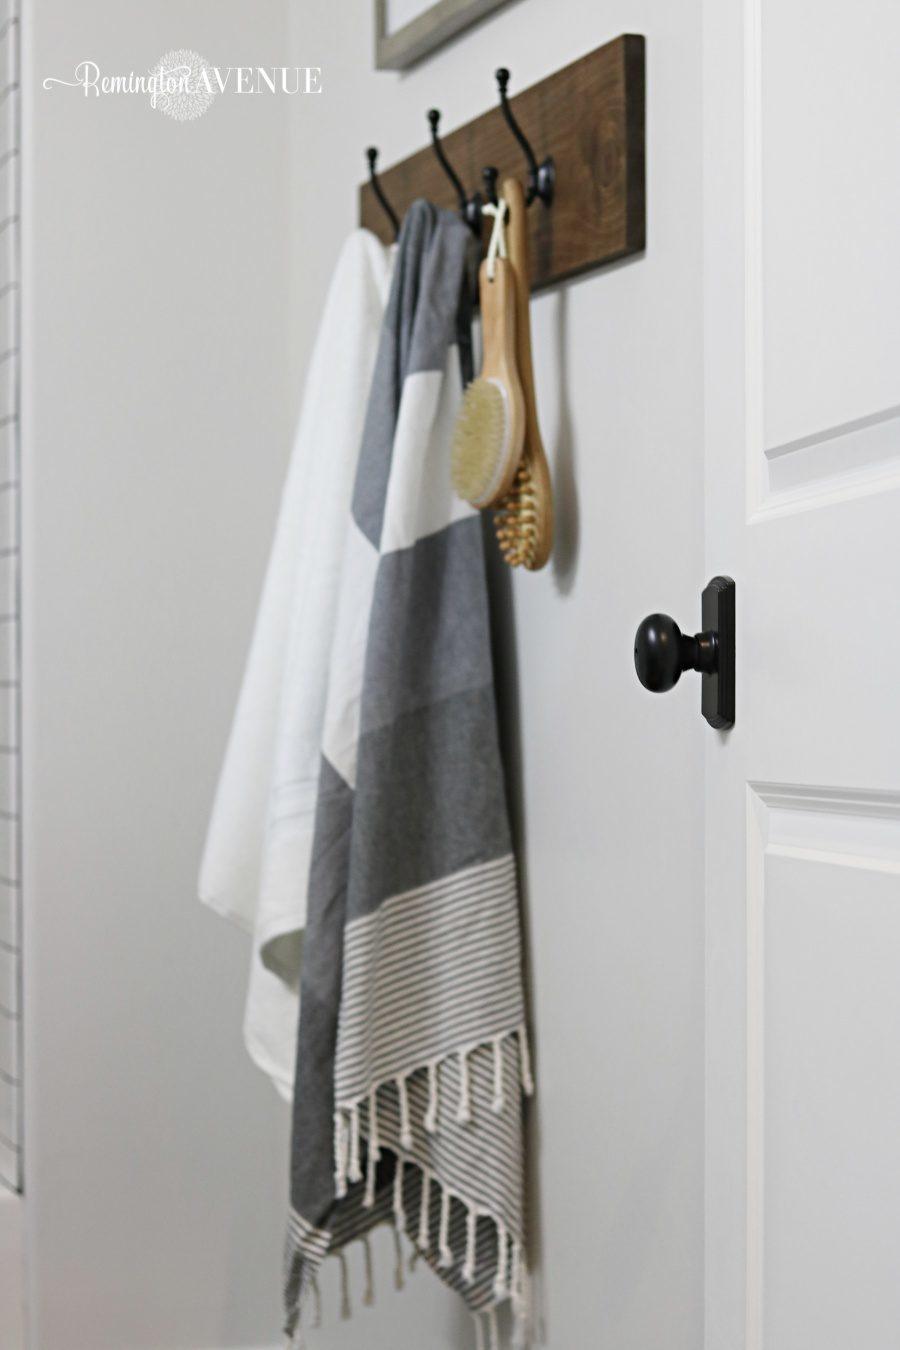 diy-towel-rack-remington-avenue-13-6518062-7910825